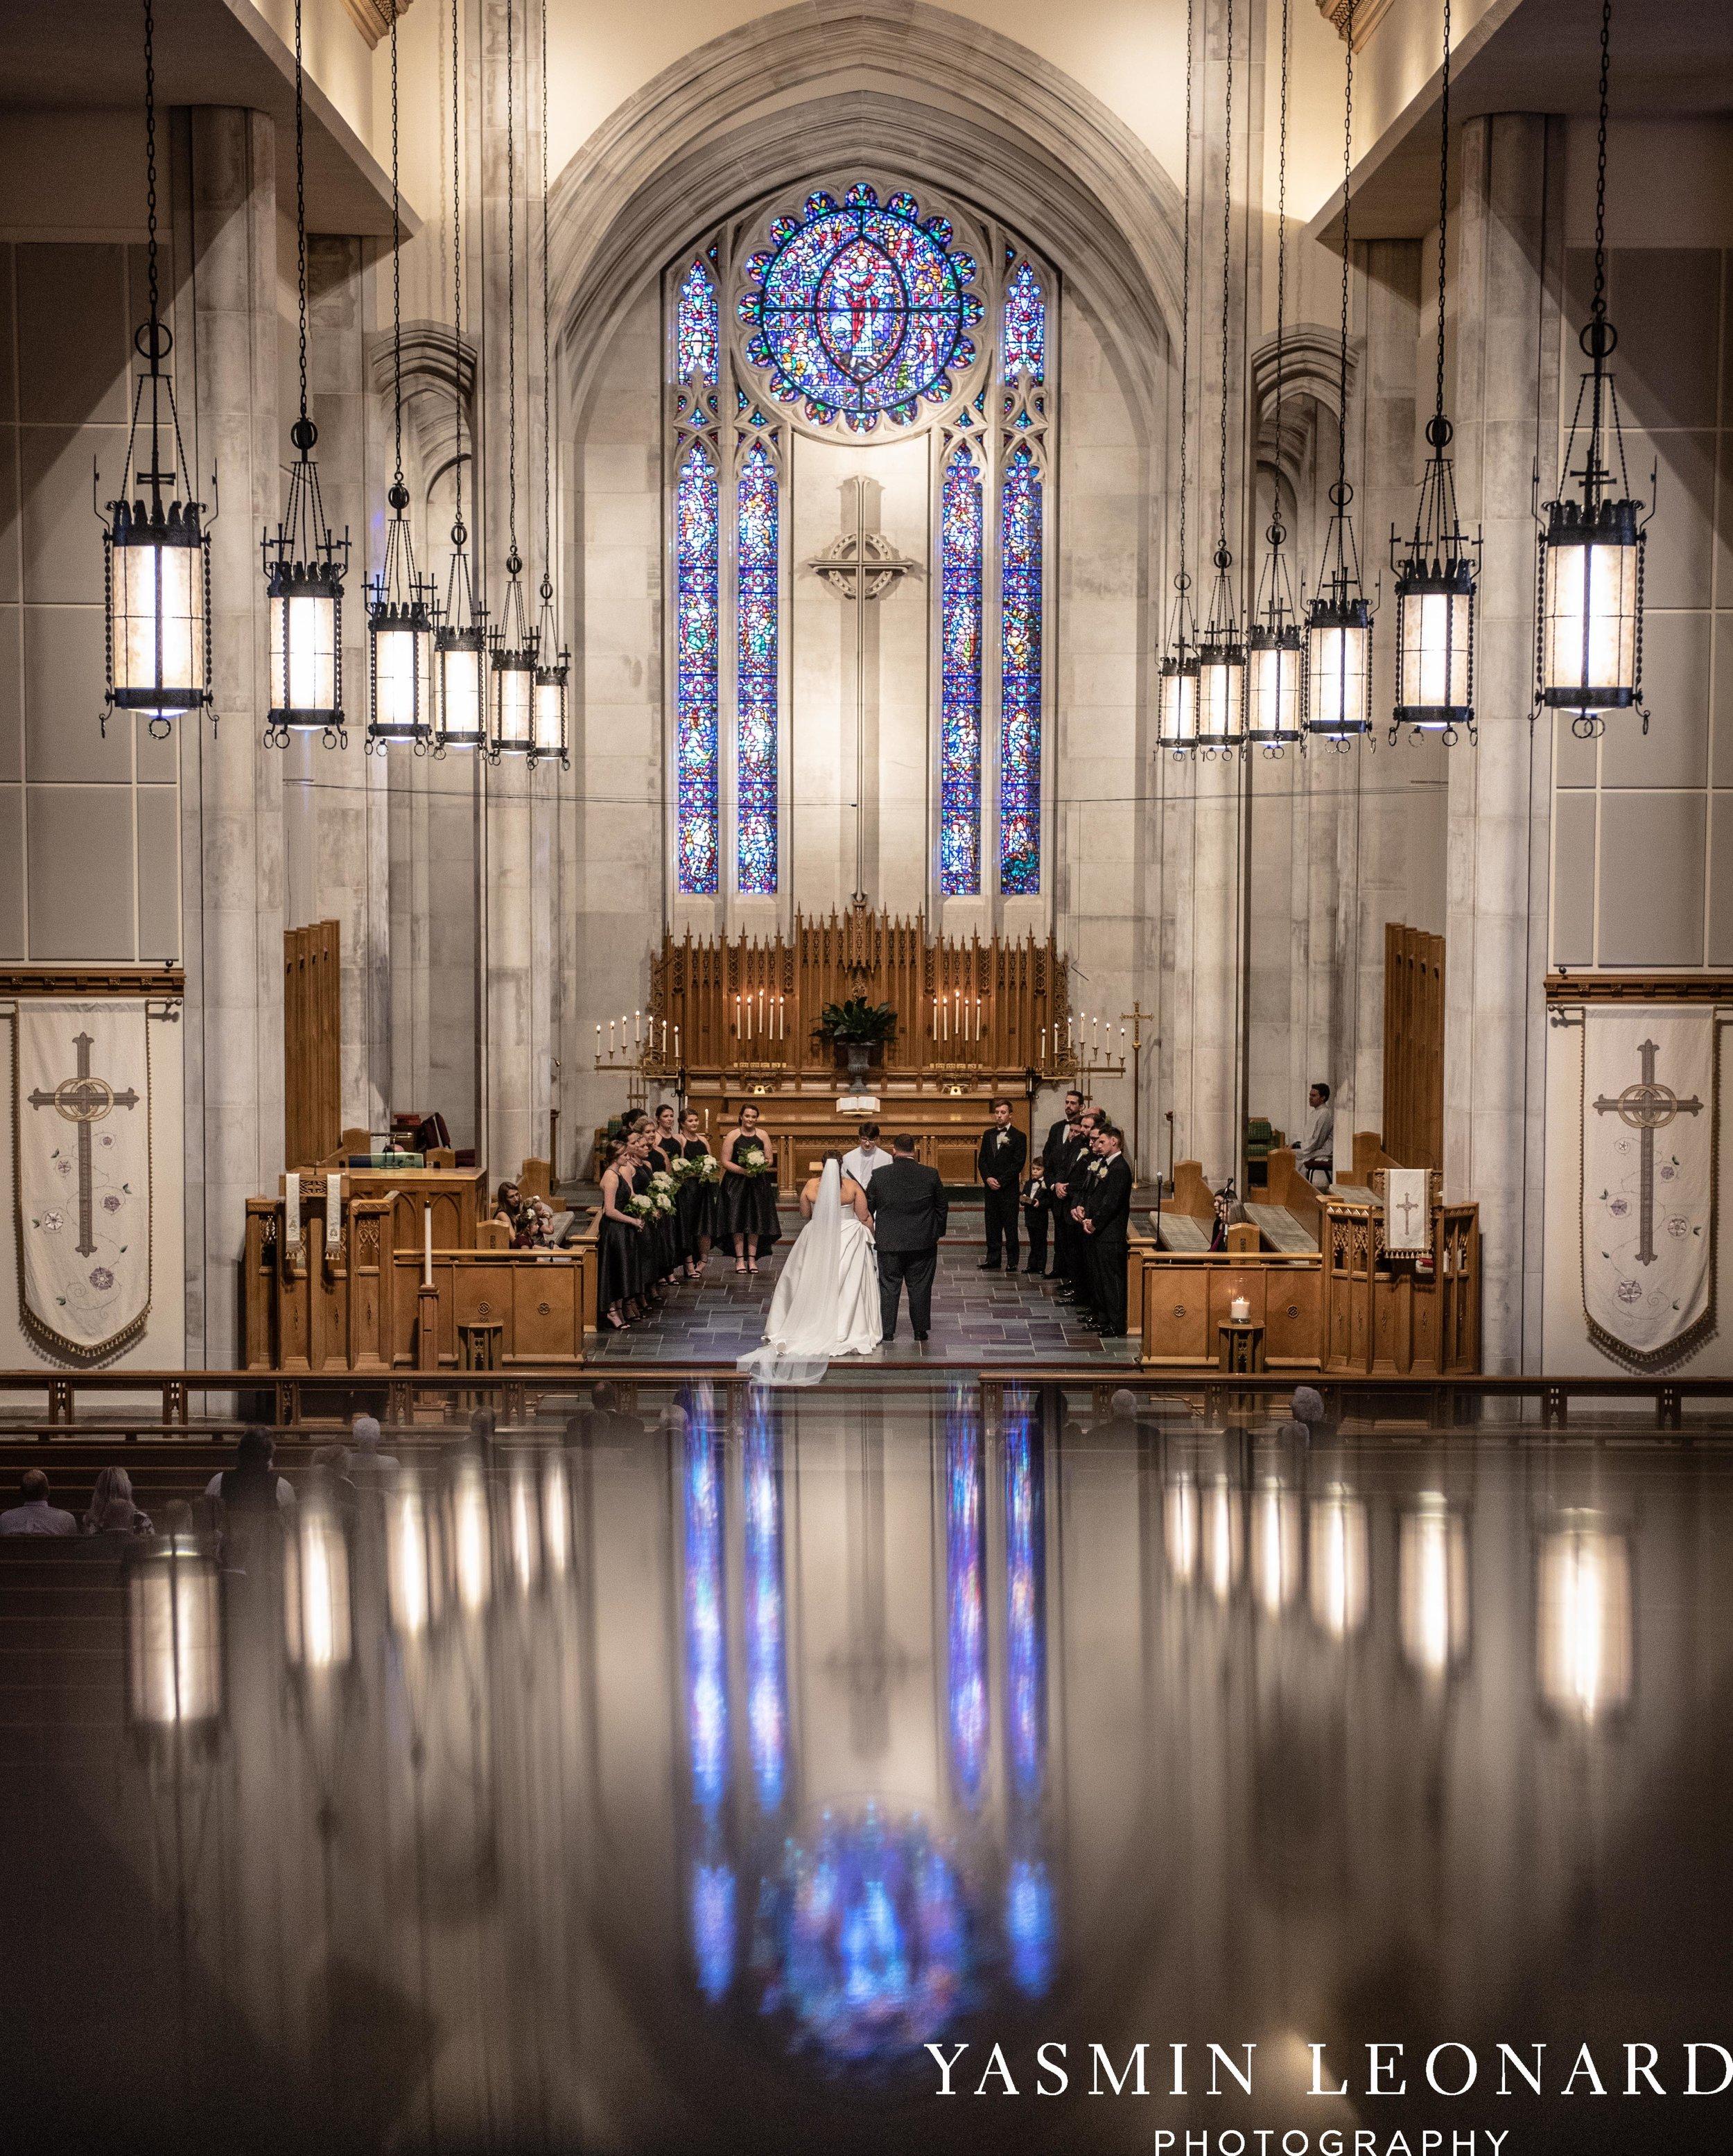 Wesley Memorial United Methodist Church - Old Homeplace Winery - High Point Weddings - High Point Wedding Photographer - NC Weddings - NC Barn Venue - Yasmin Leonard Photography-15.jpg